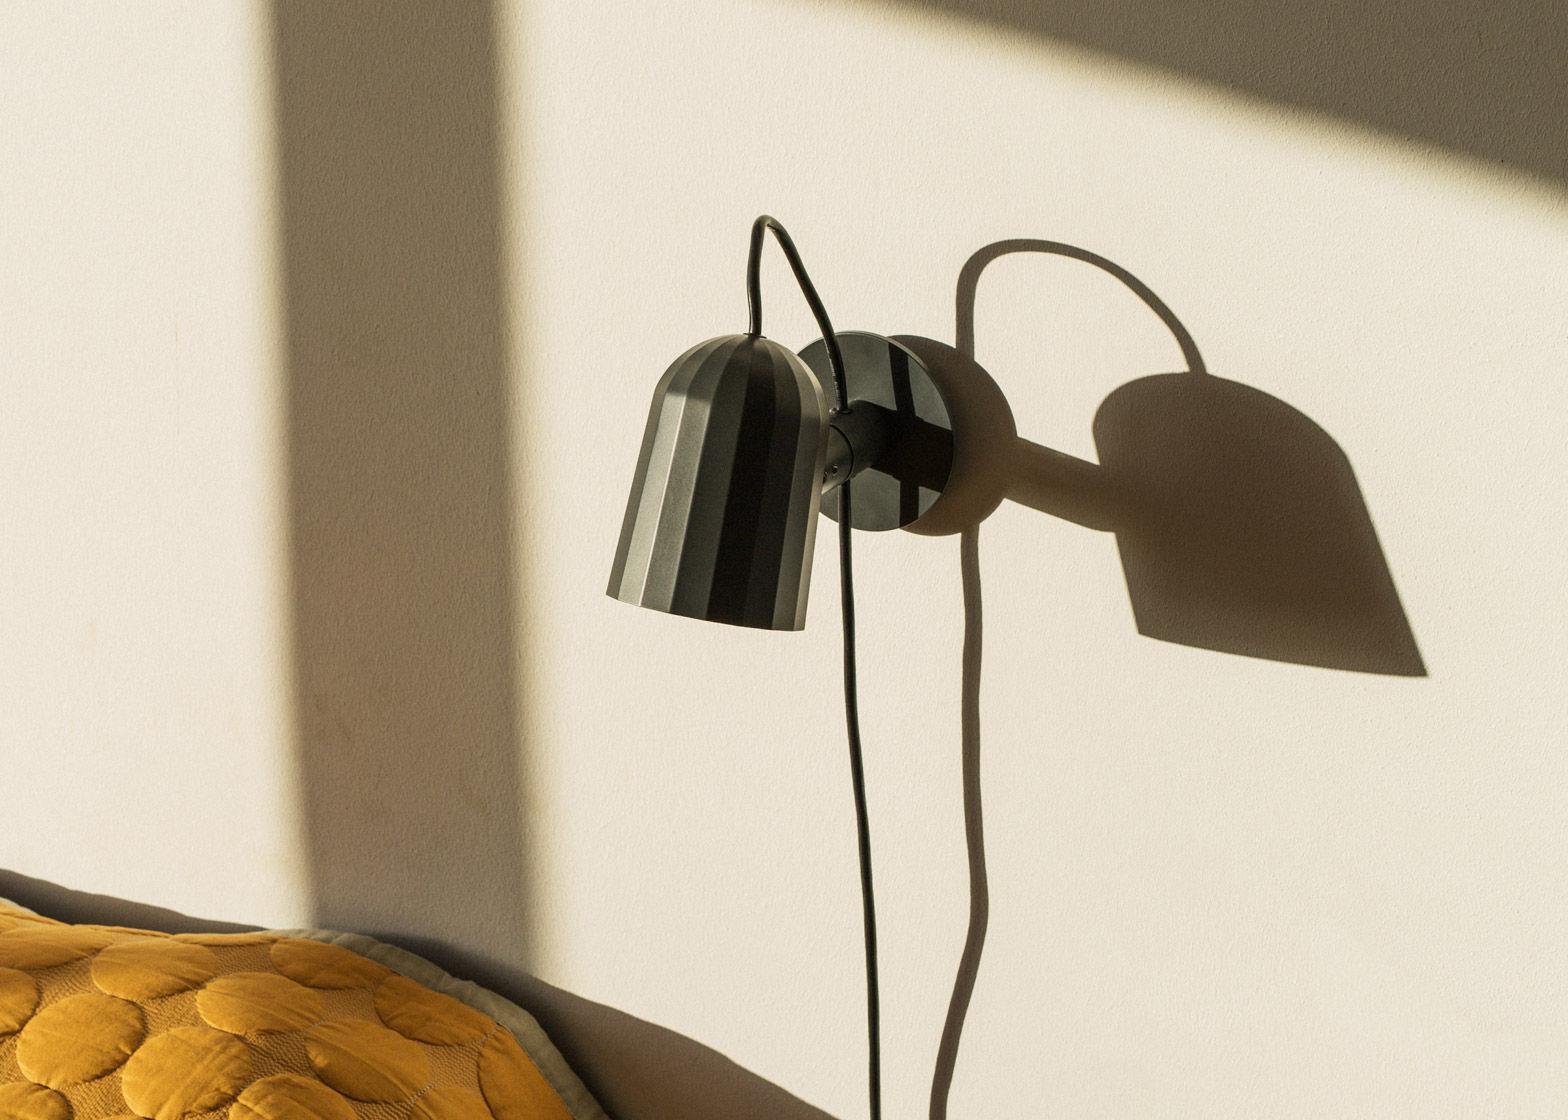 noc metall kabel mit netzstecker wandleuchte mit stromkabel. Black Bedroom Furniture Sets. Home Design Ideas